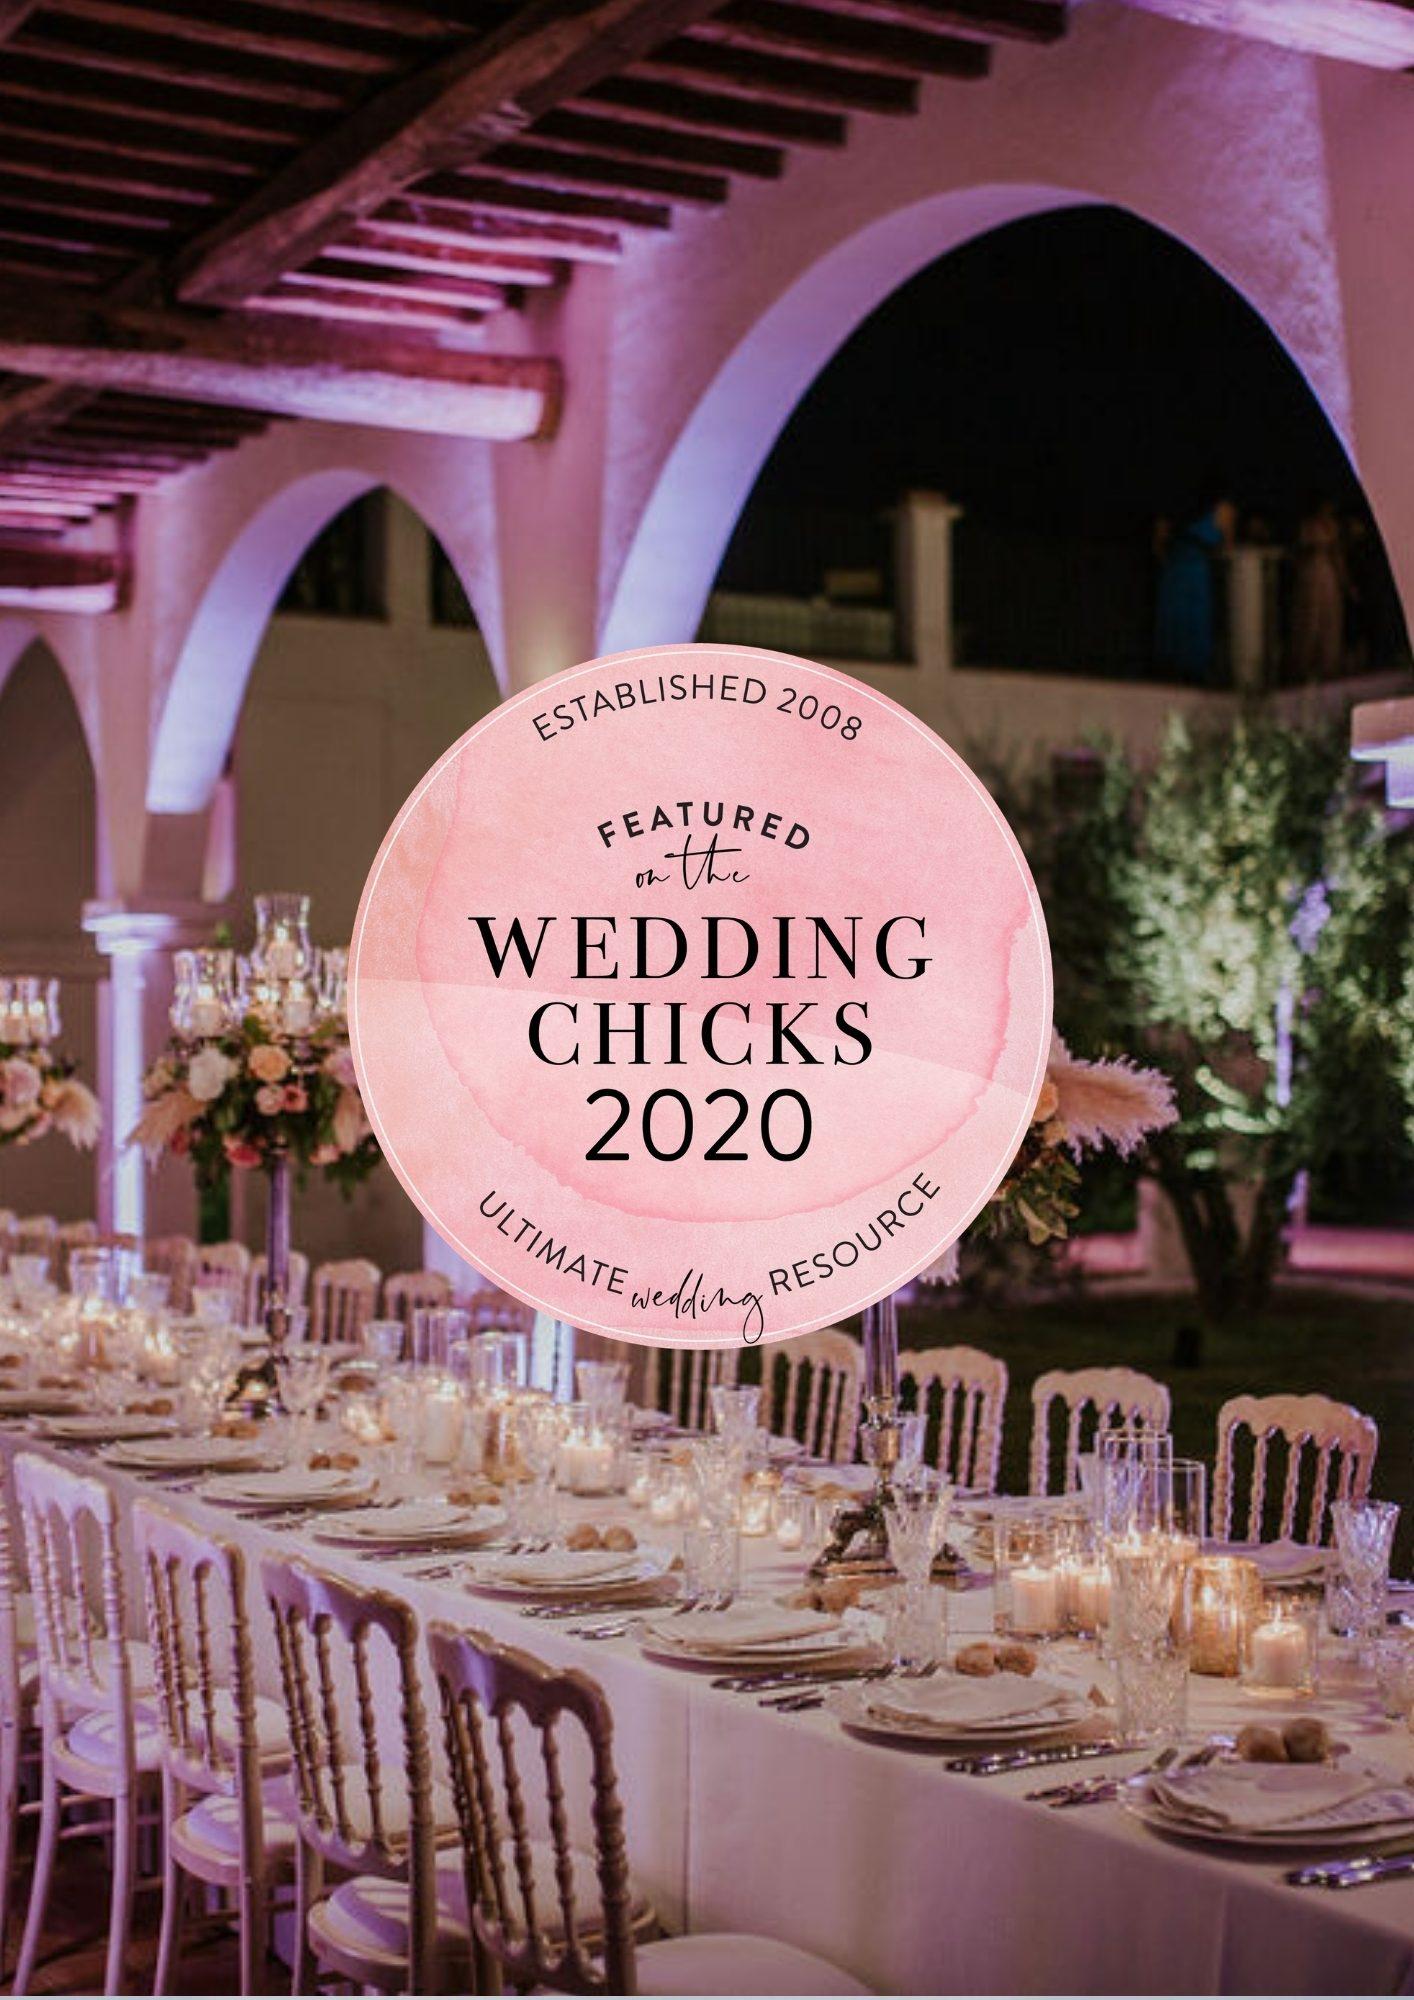 Giulia-Alessandri-Wedding-Planner-Toscana_-Pubblicazione-su-Wedding Chicks